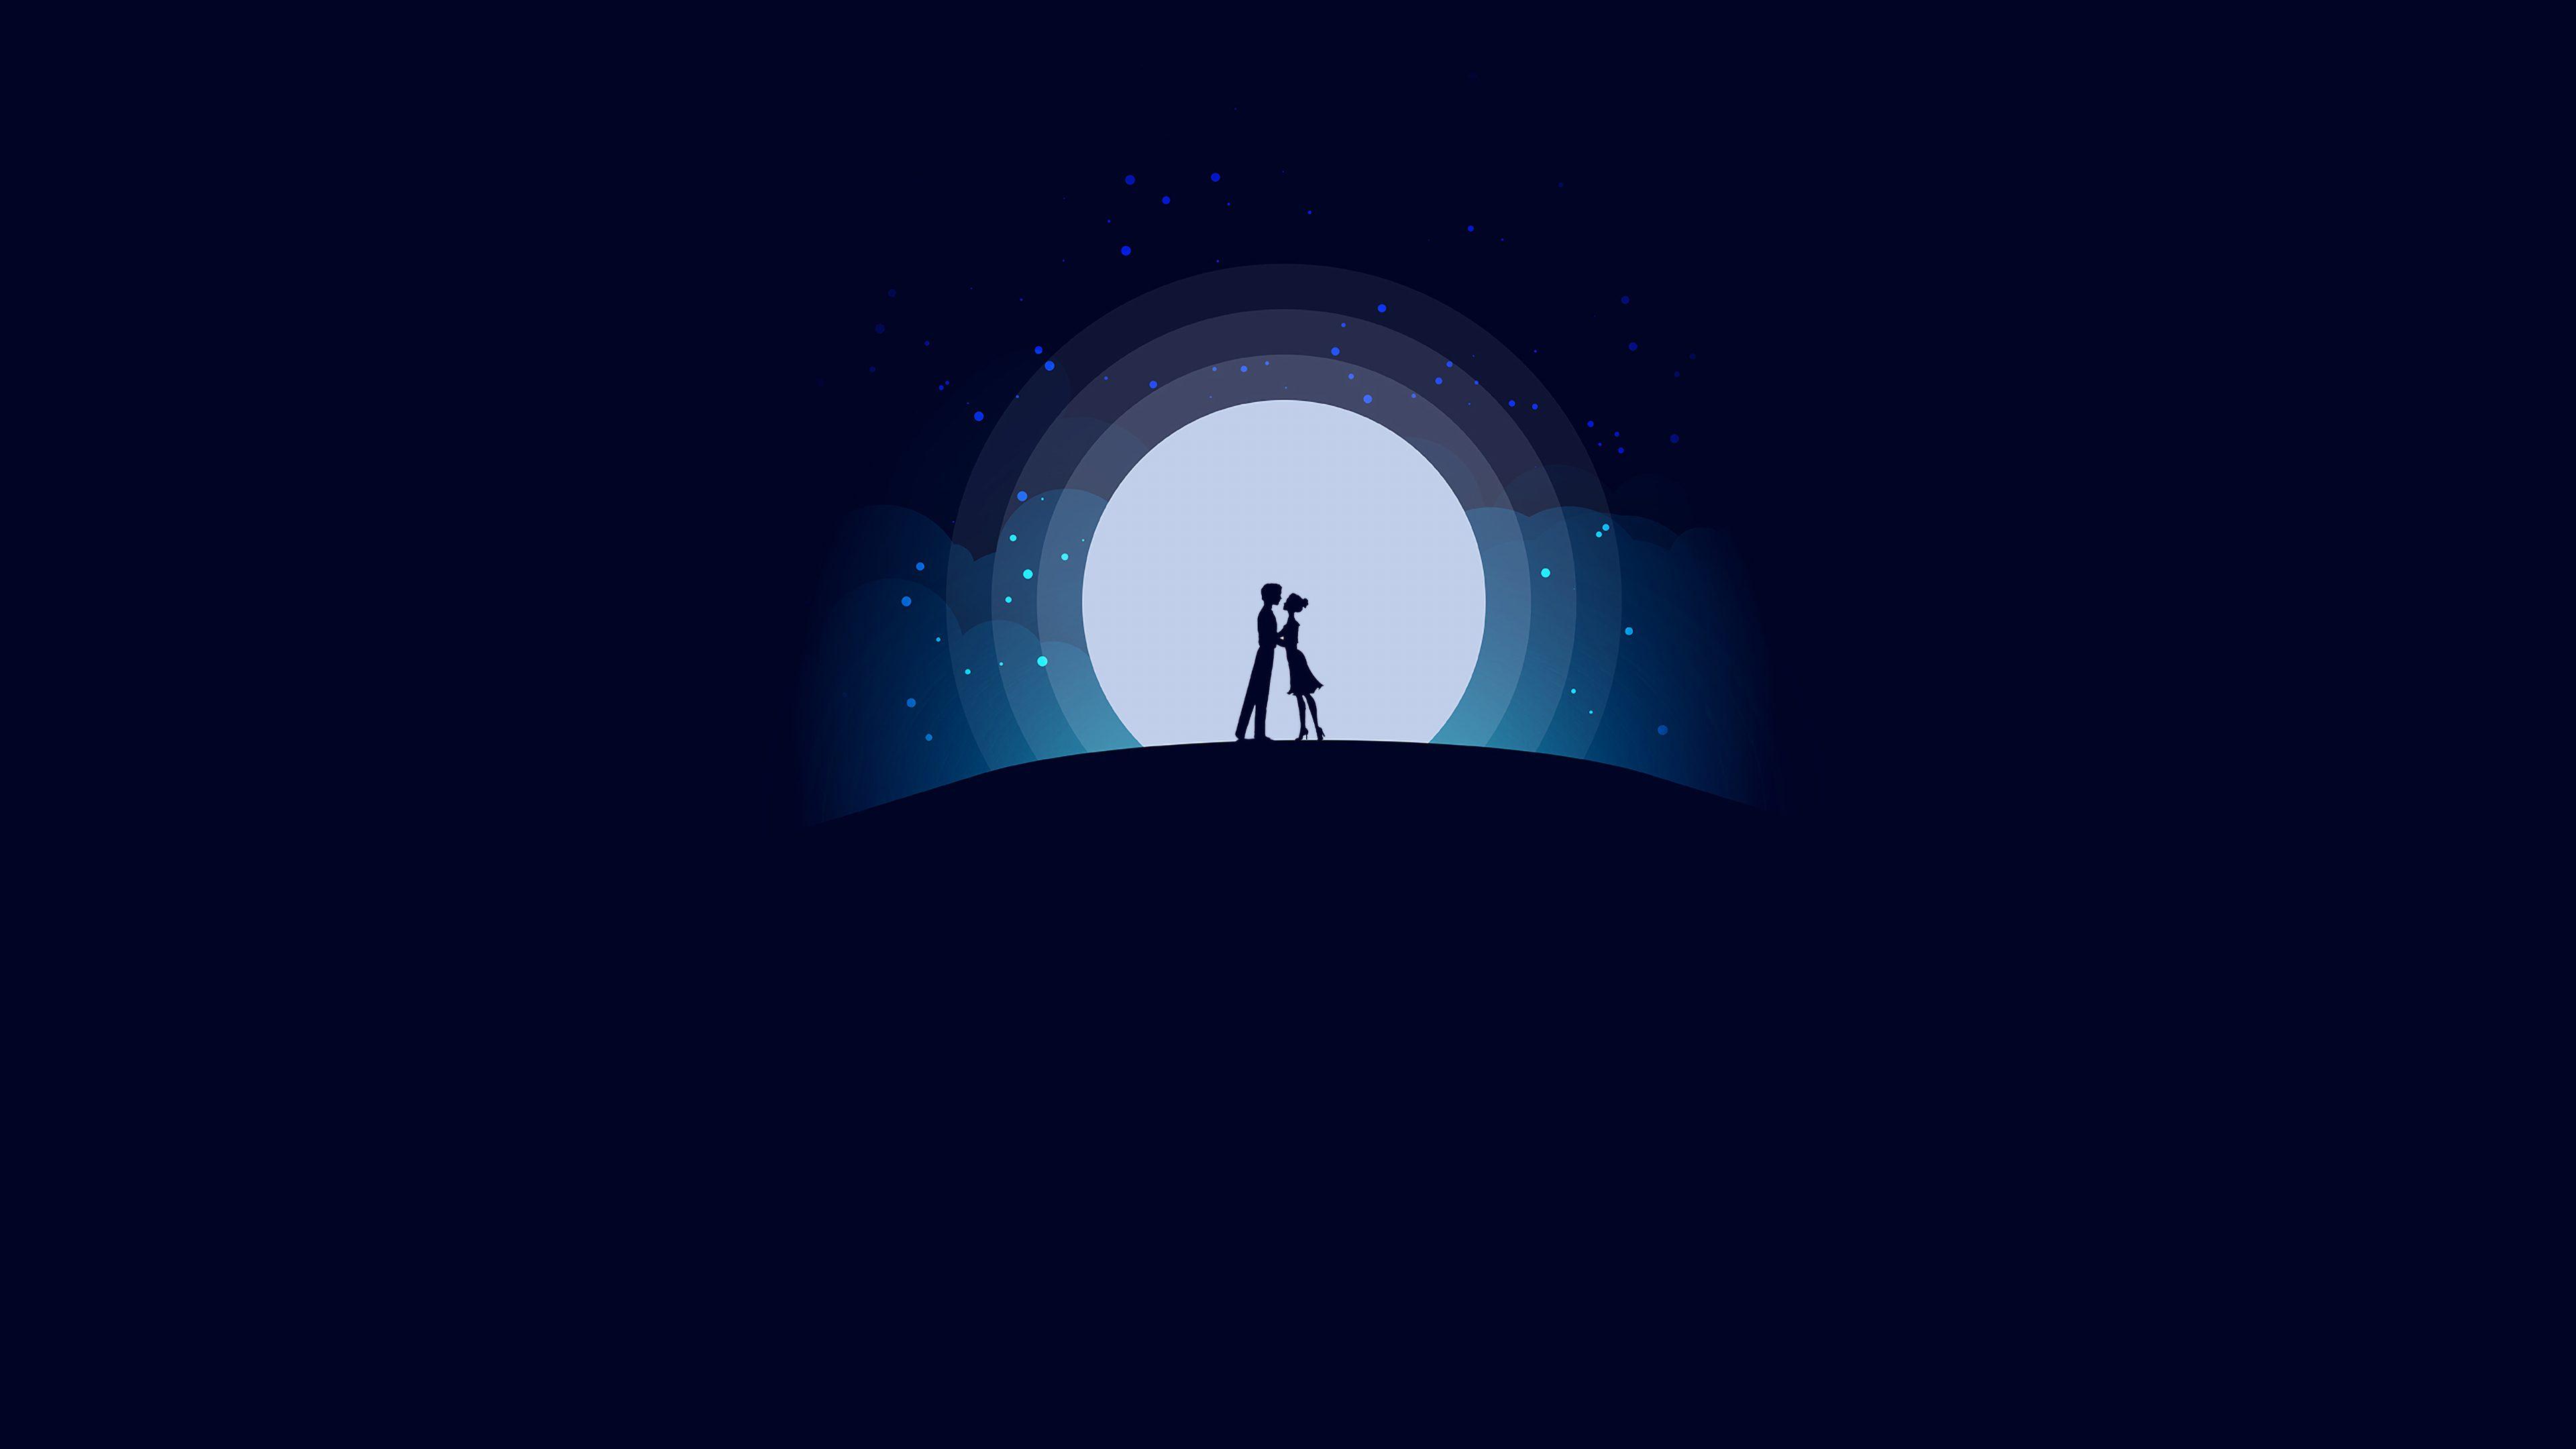 Digital Art Moon Night Blue Lover Love 4k Wallpaper Best Wallpapers